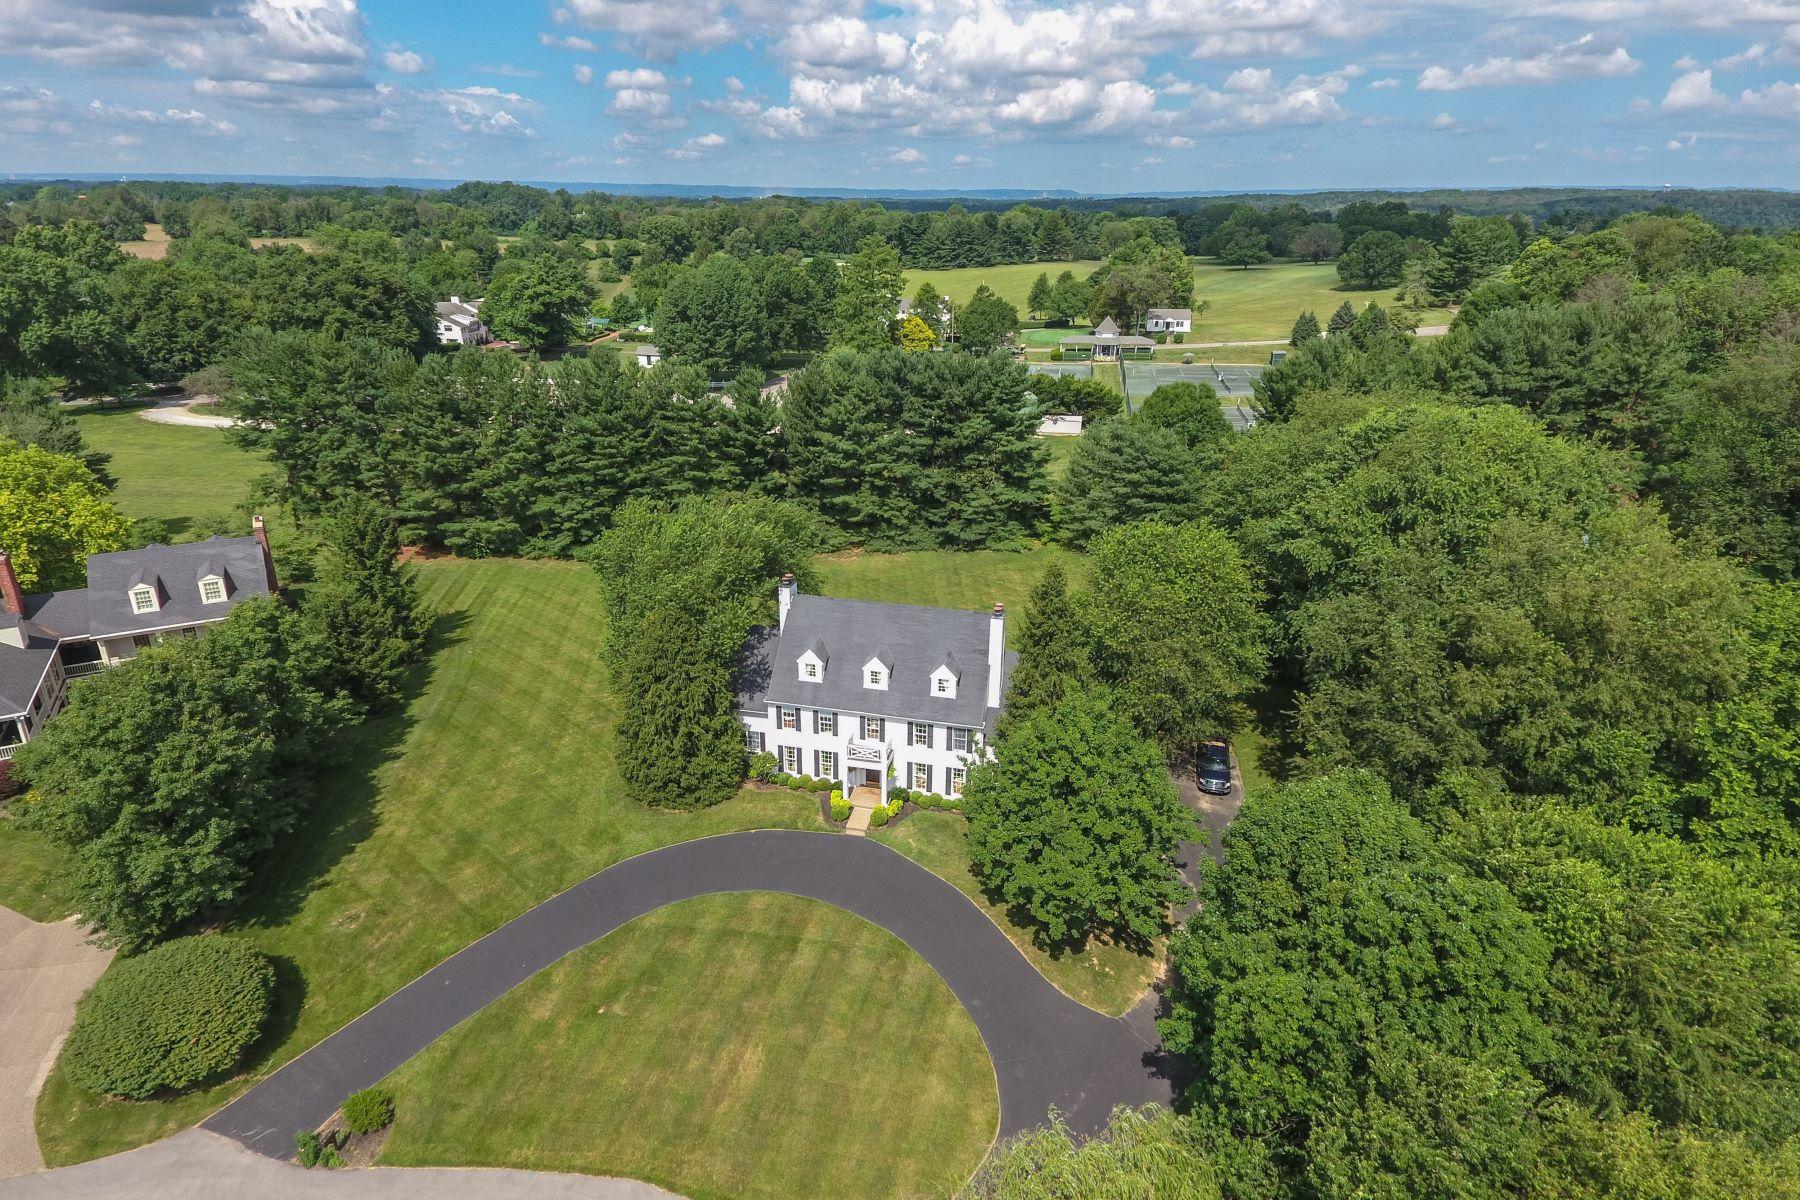 Single Family Home for Sale at 1000 Dorset Court Goshen, Kentucky, 40026 United States